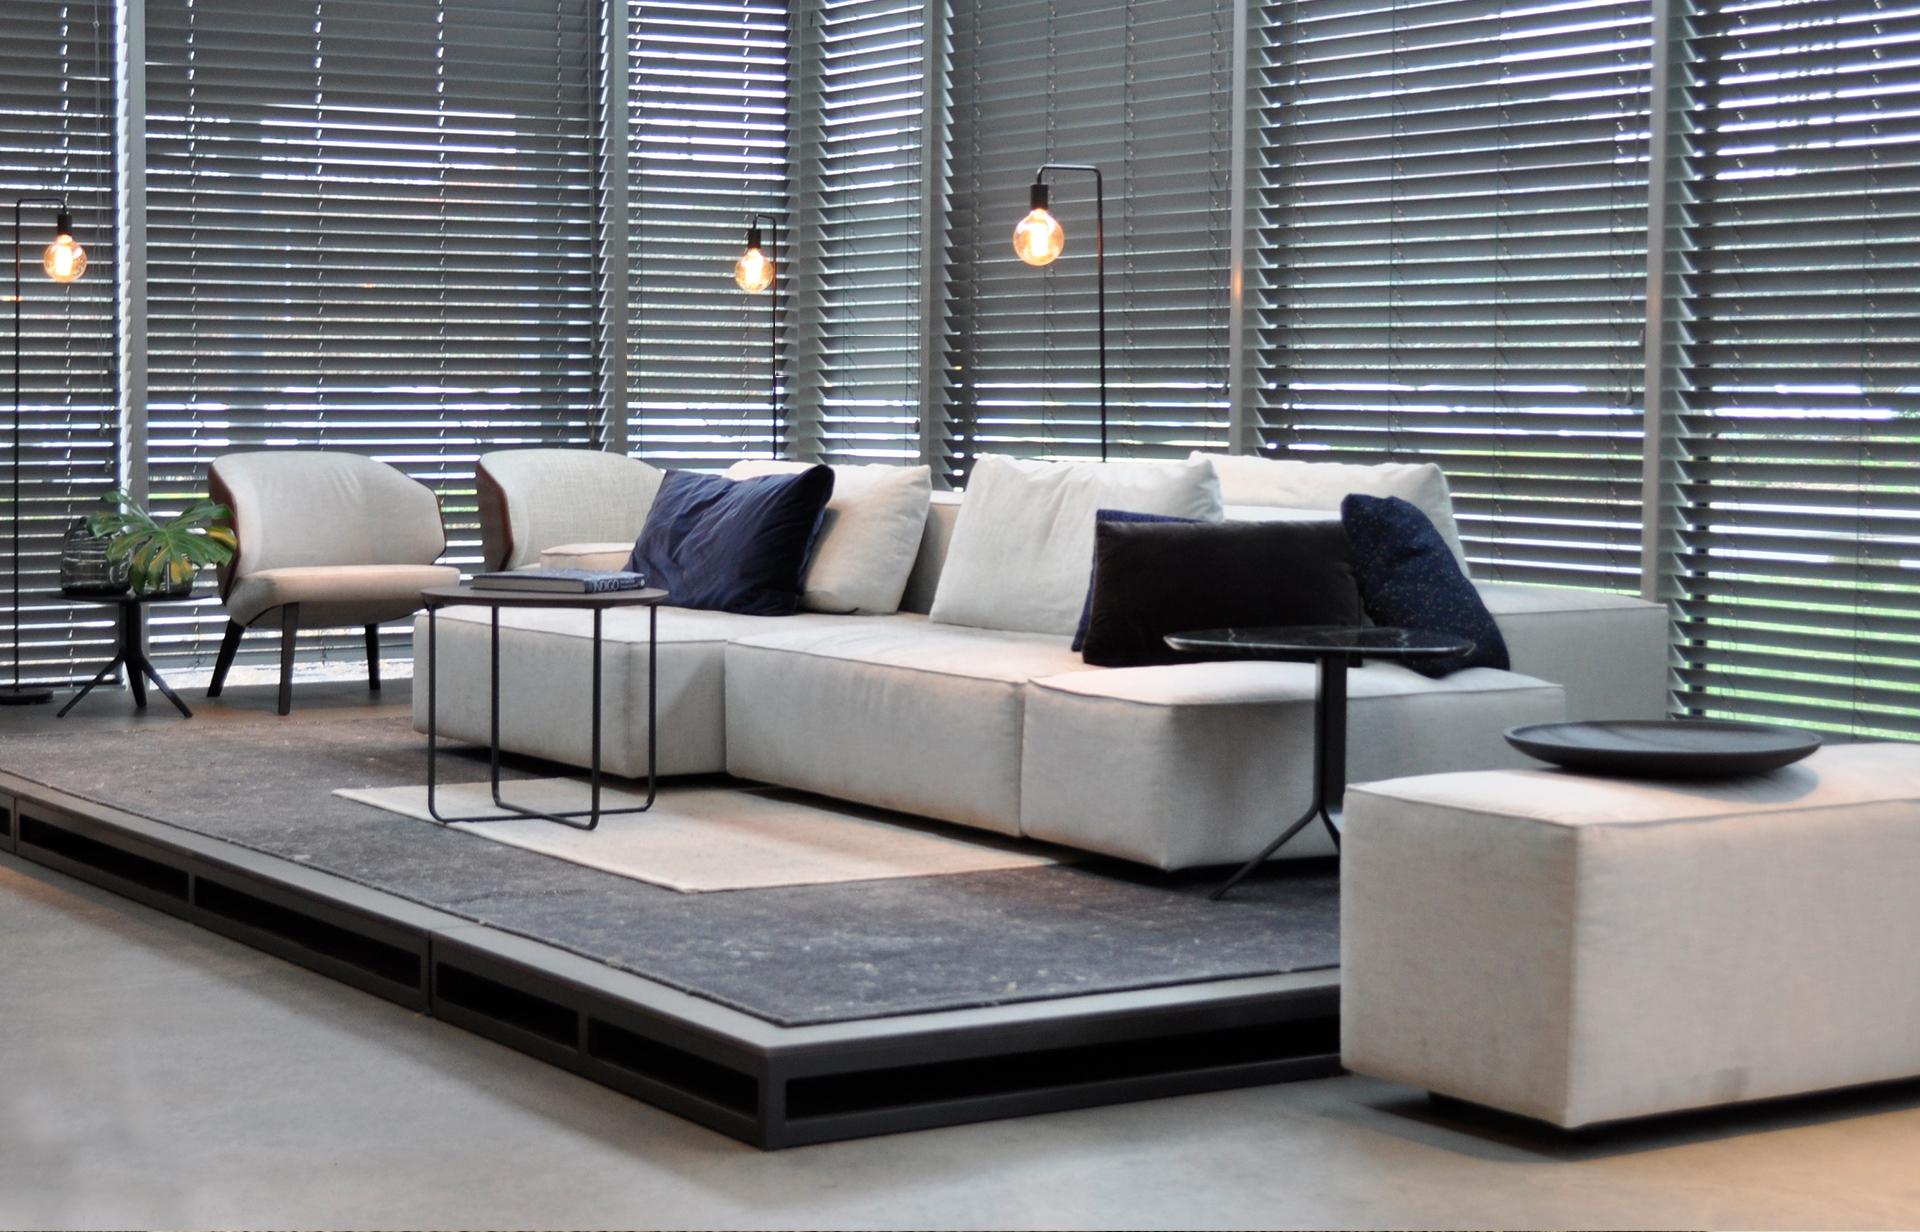 Montis Design Bank.Montis Impression Imm Cologne 2018